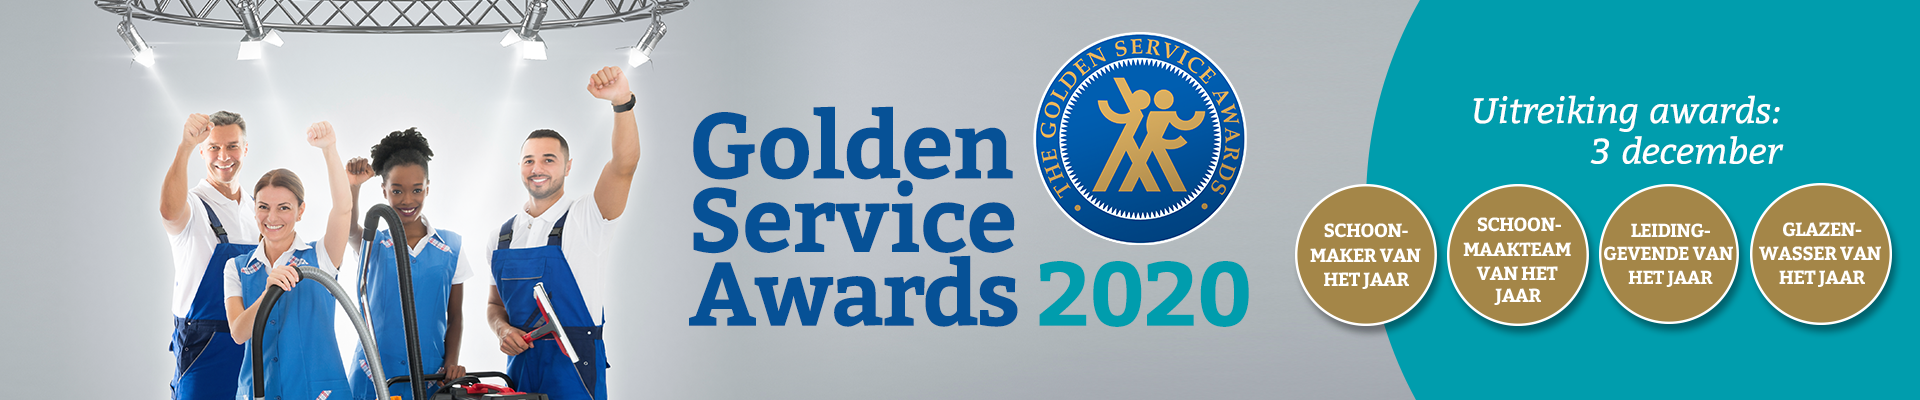 Golden Service Awards 2020